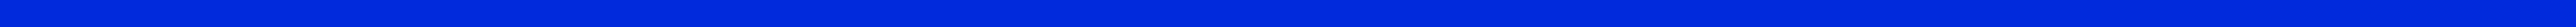 Blue Divider Bar